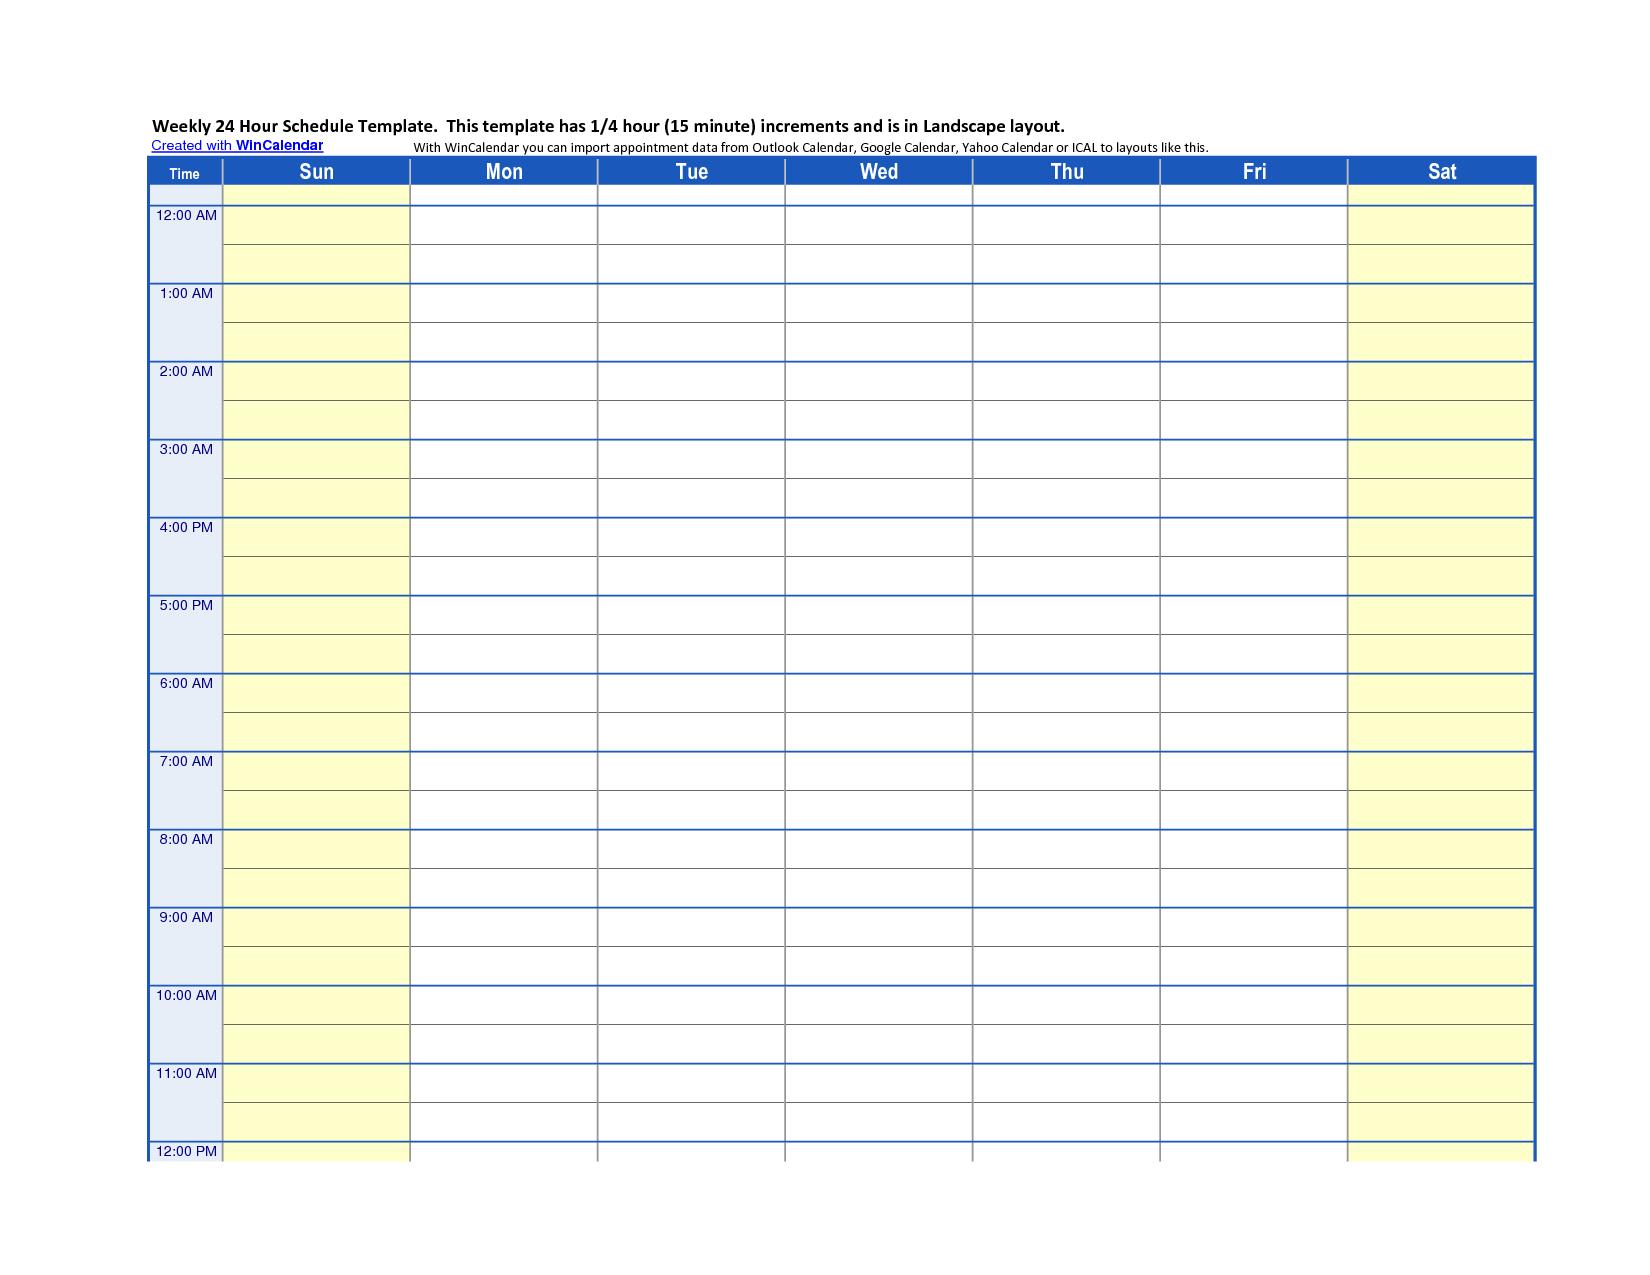 24 Hour Work Schedule Template Free | best online resume builder.